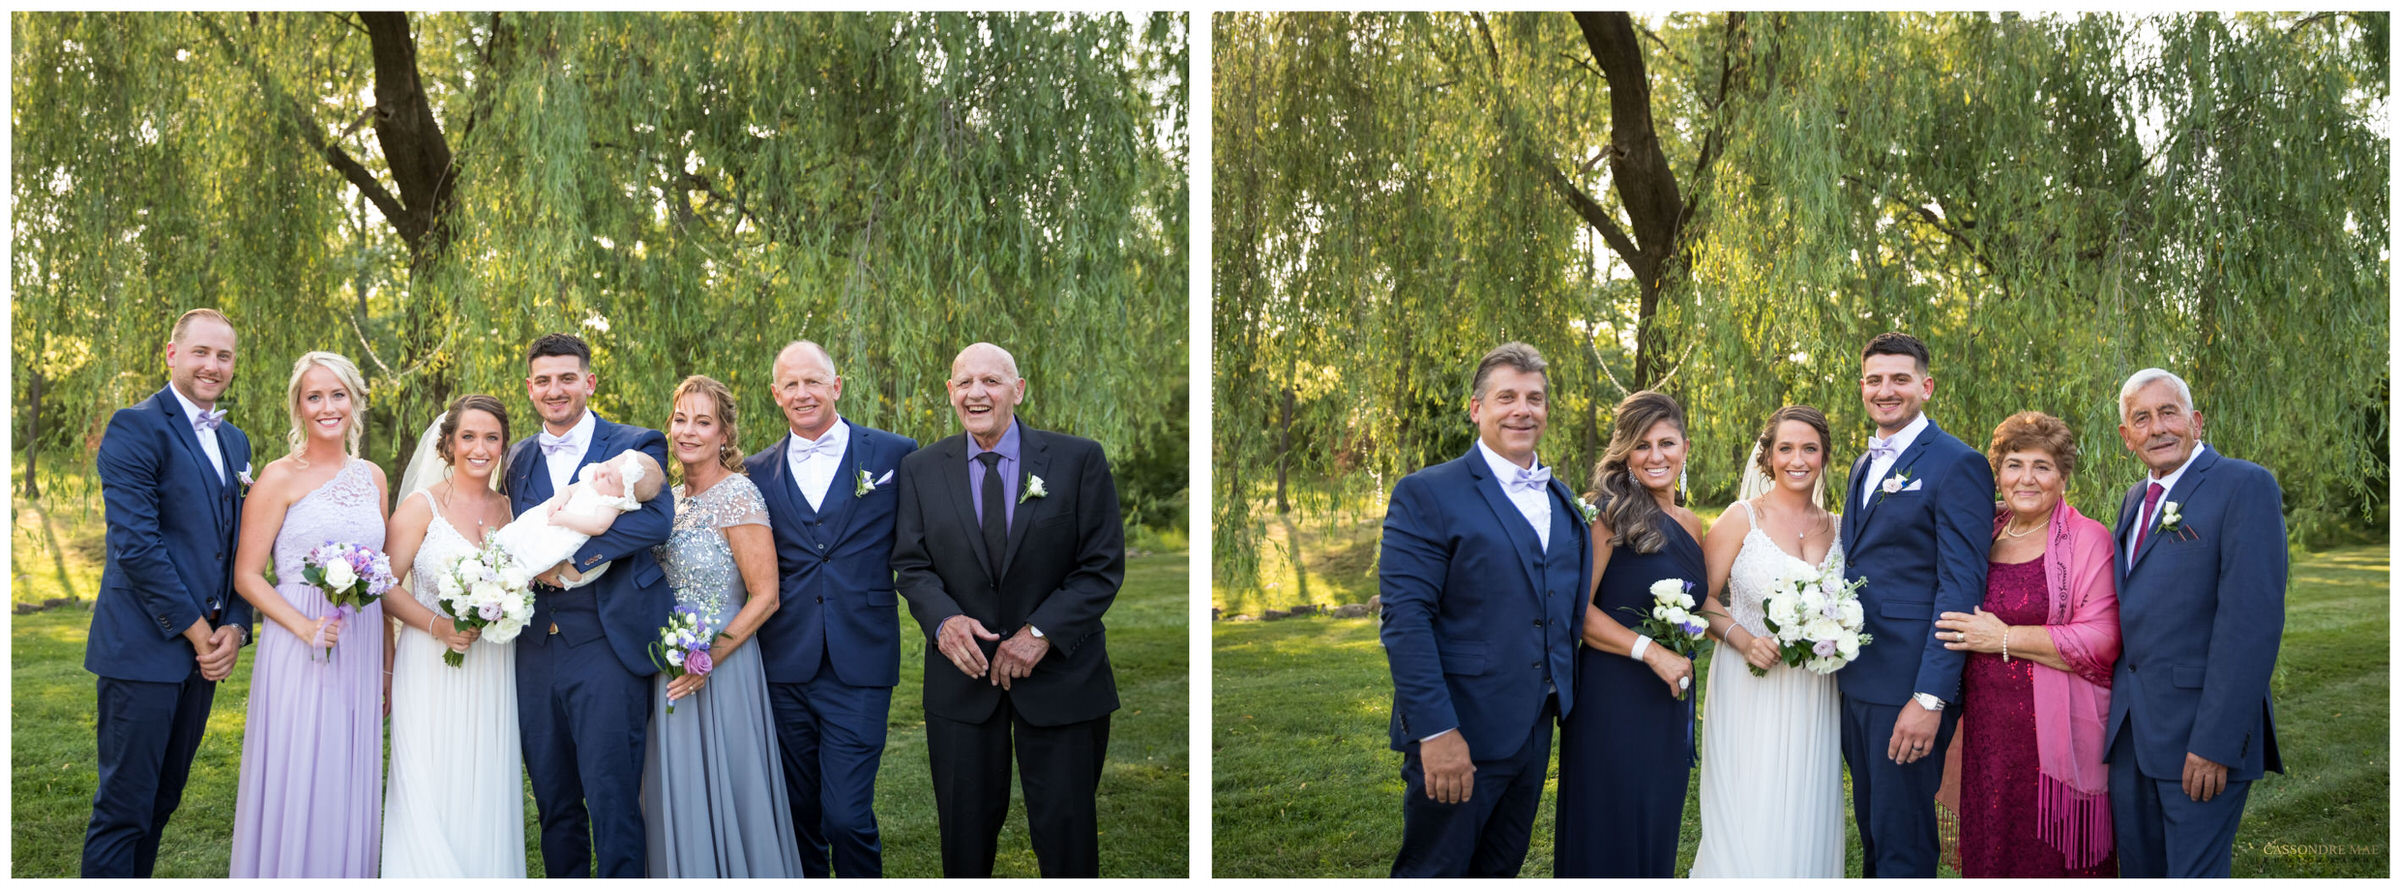 Cassondre Mae Photography Villa Venezia Wedding Photographer 24.jpg